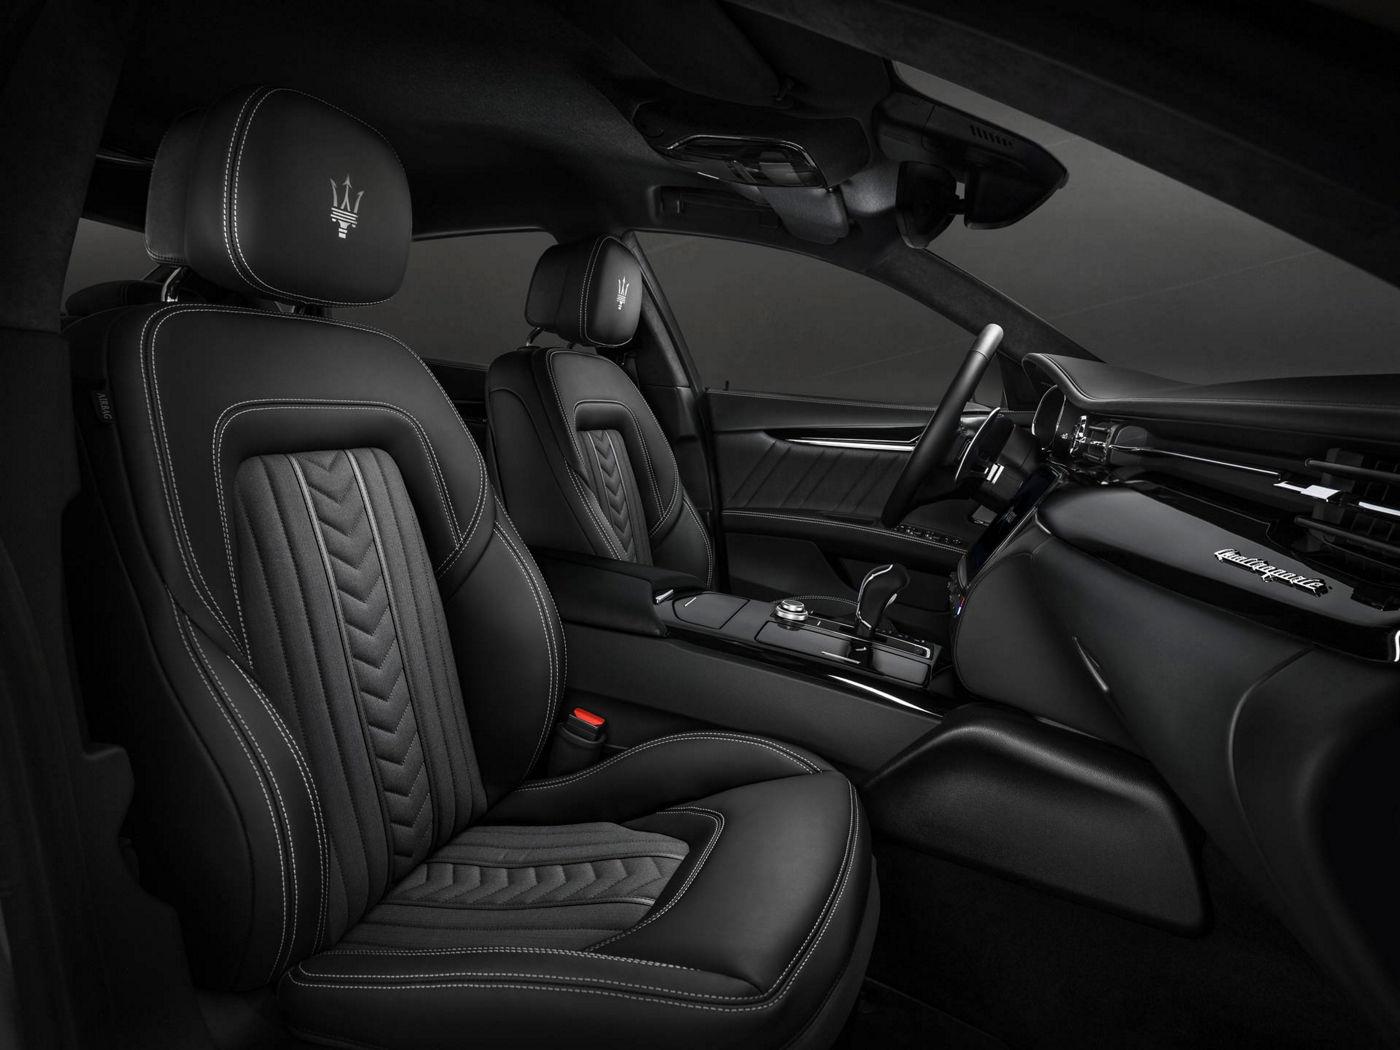 Seats black leather design details - Maserati Quattroporte GranLusso